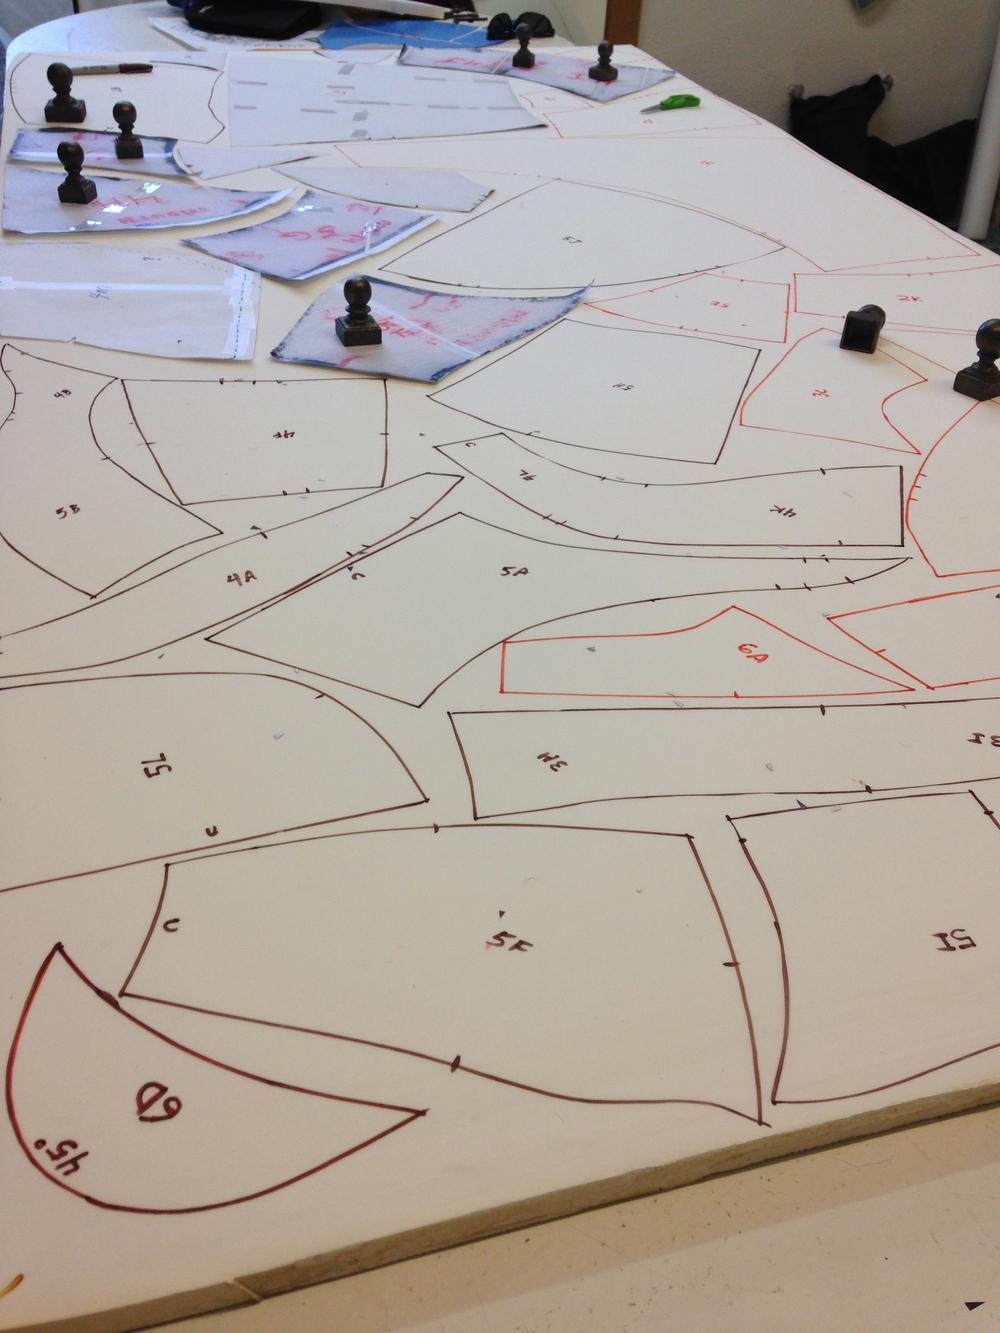 Tiger Head patterns traced to foam by Matthew McAvene